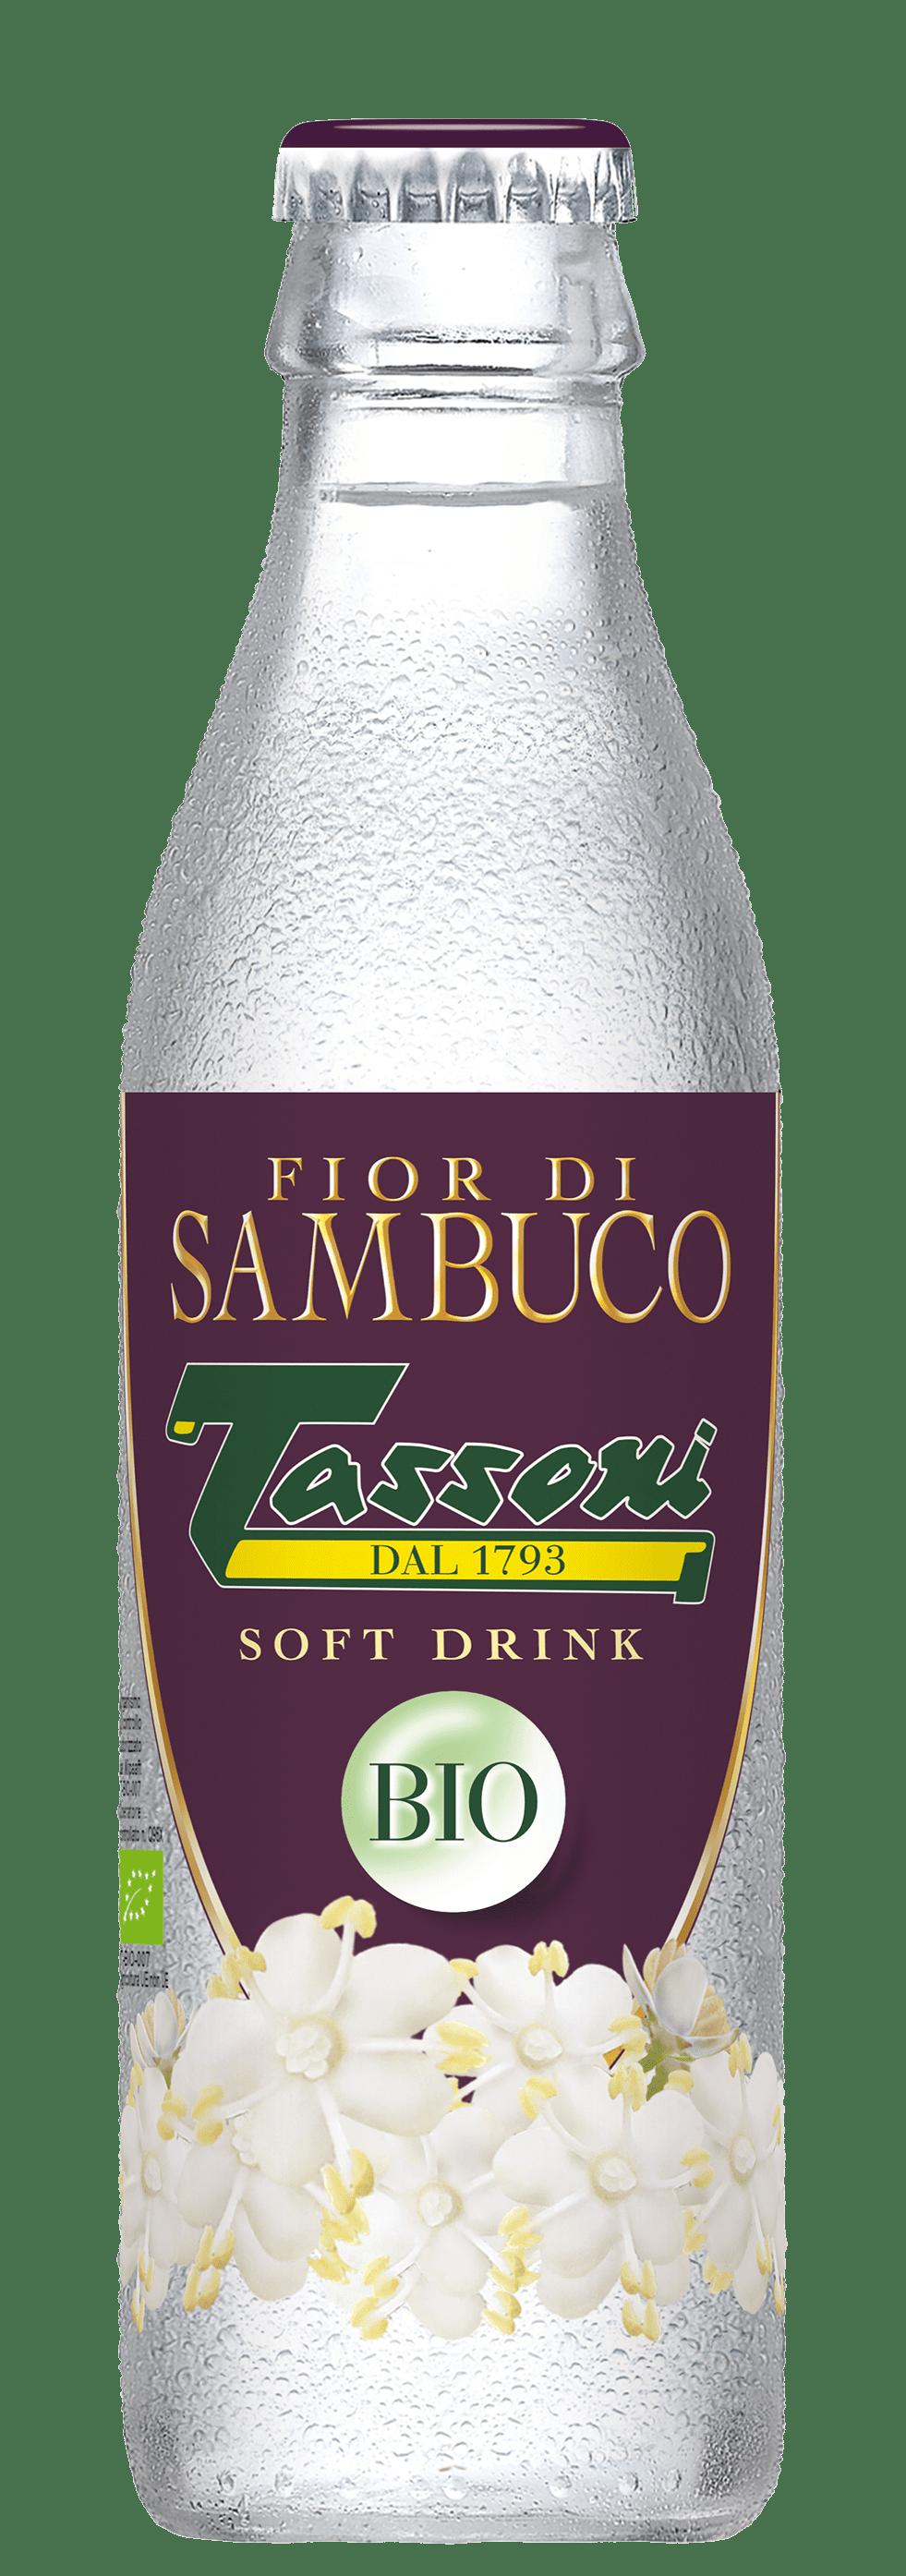 "Elderflower Tonic ""Fior di Sambuco"""